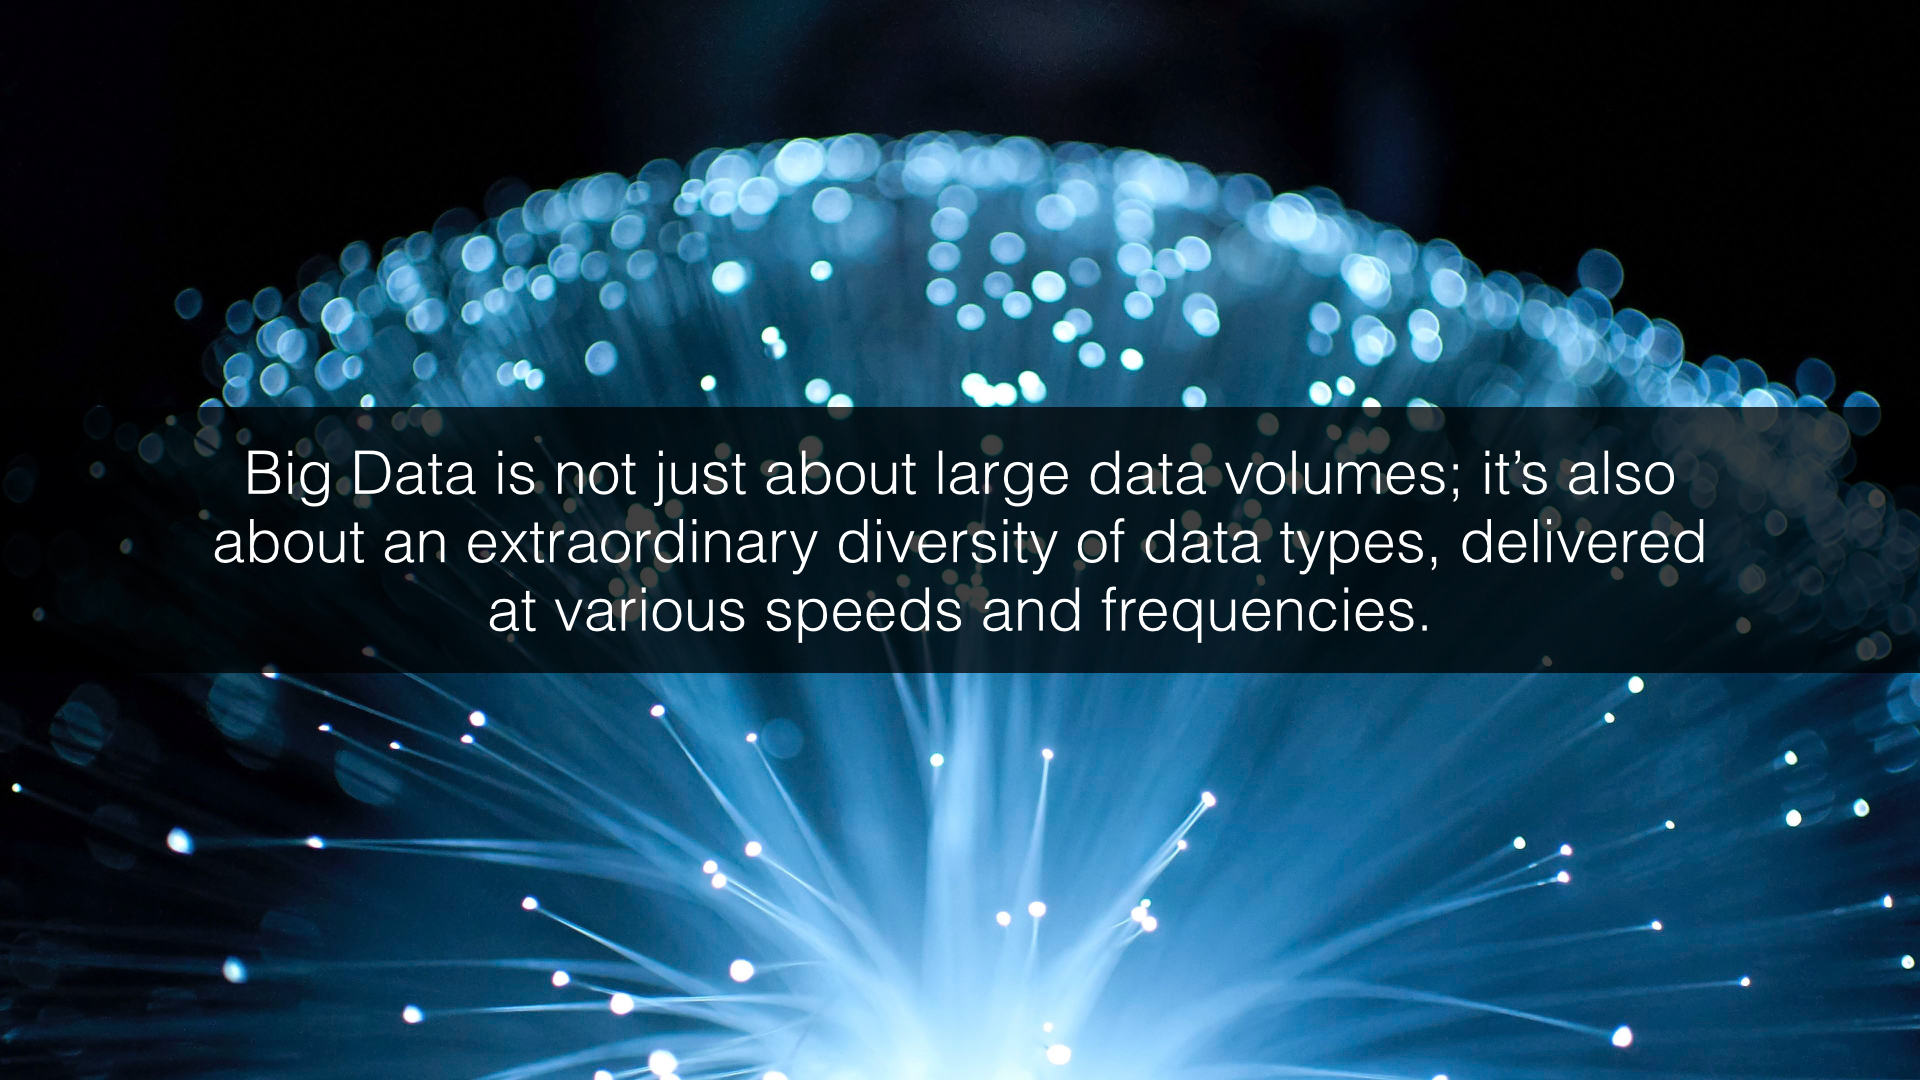 sdg-big-data.004.jpg